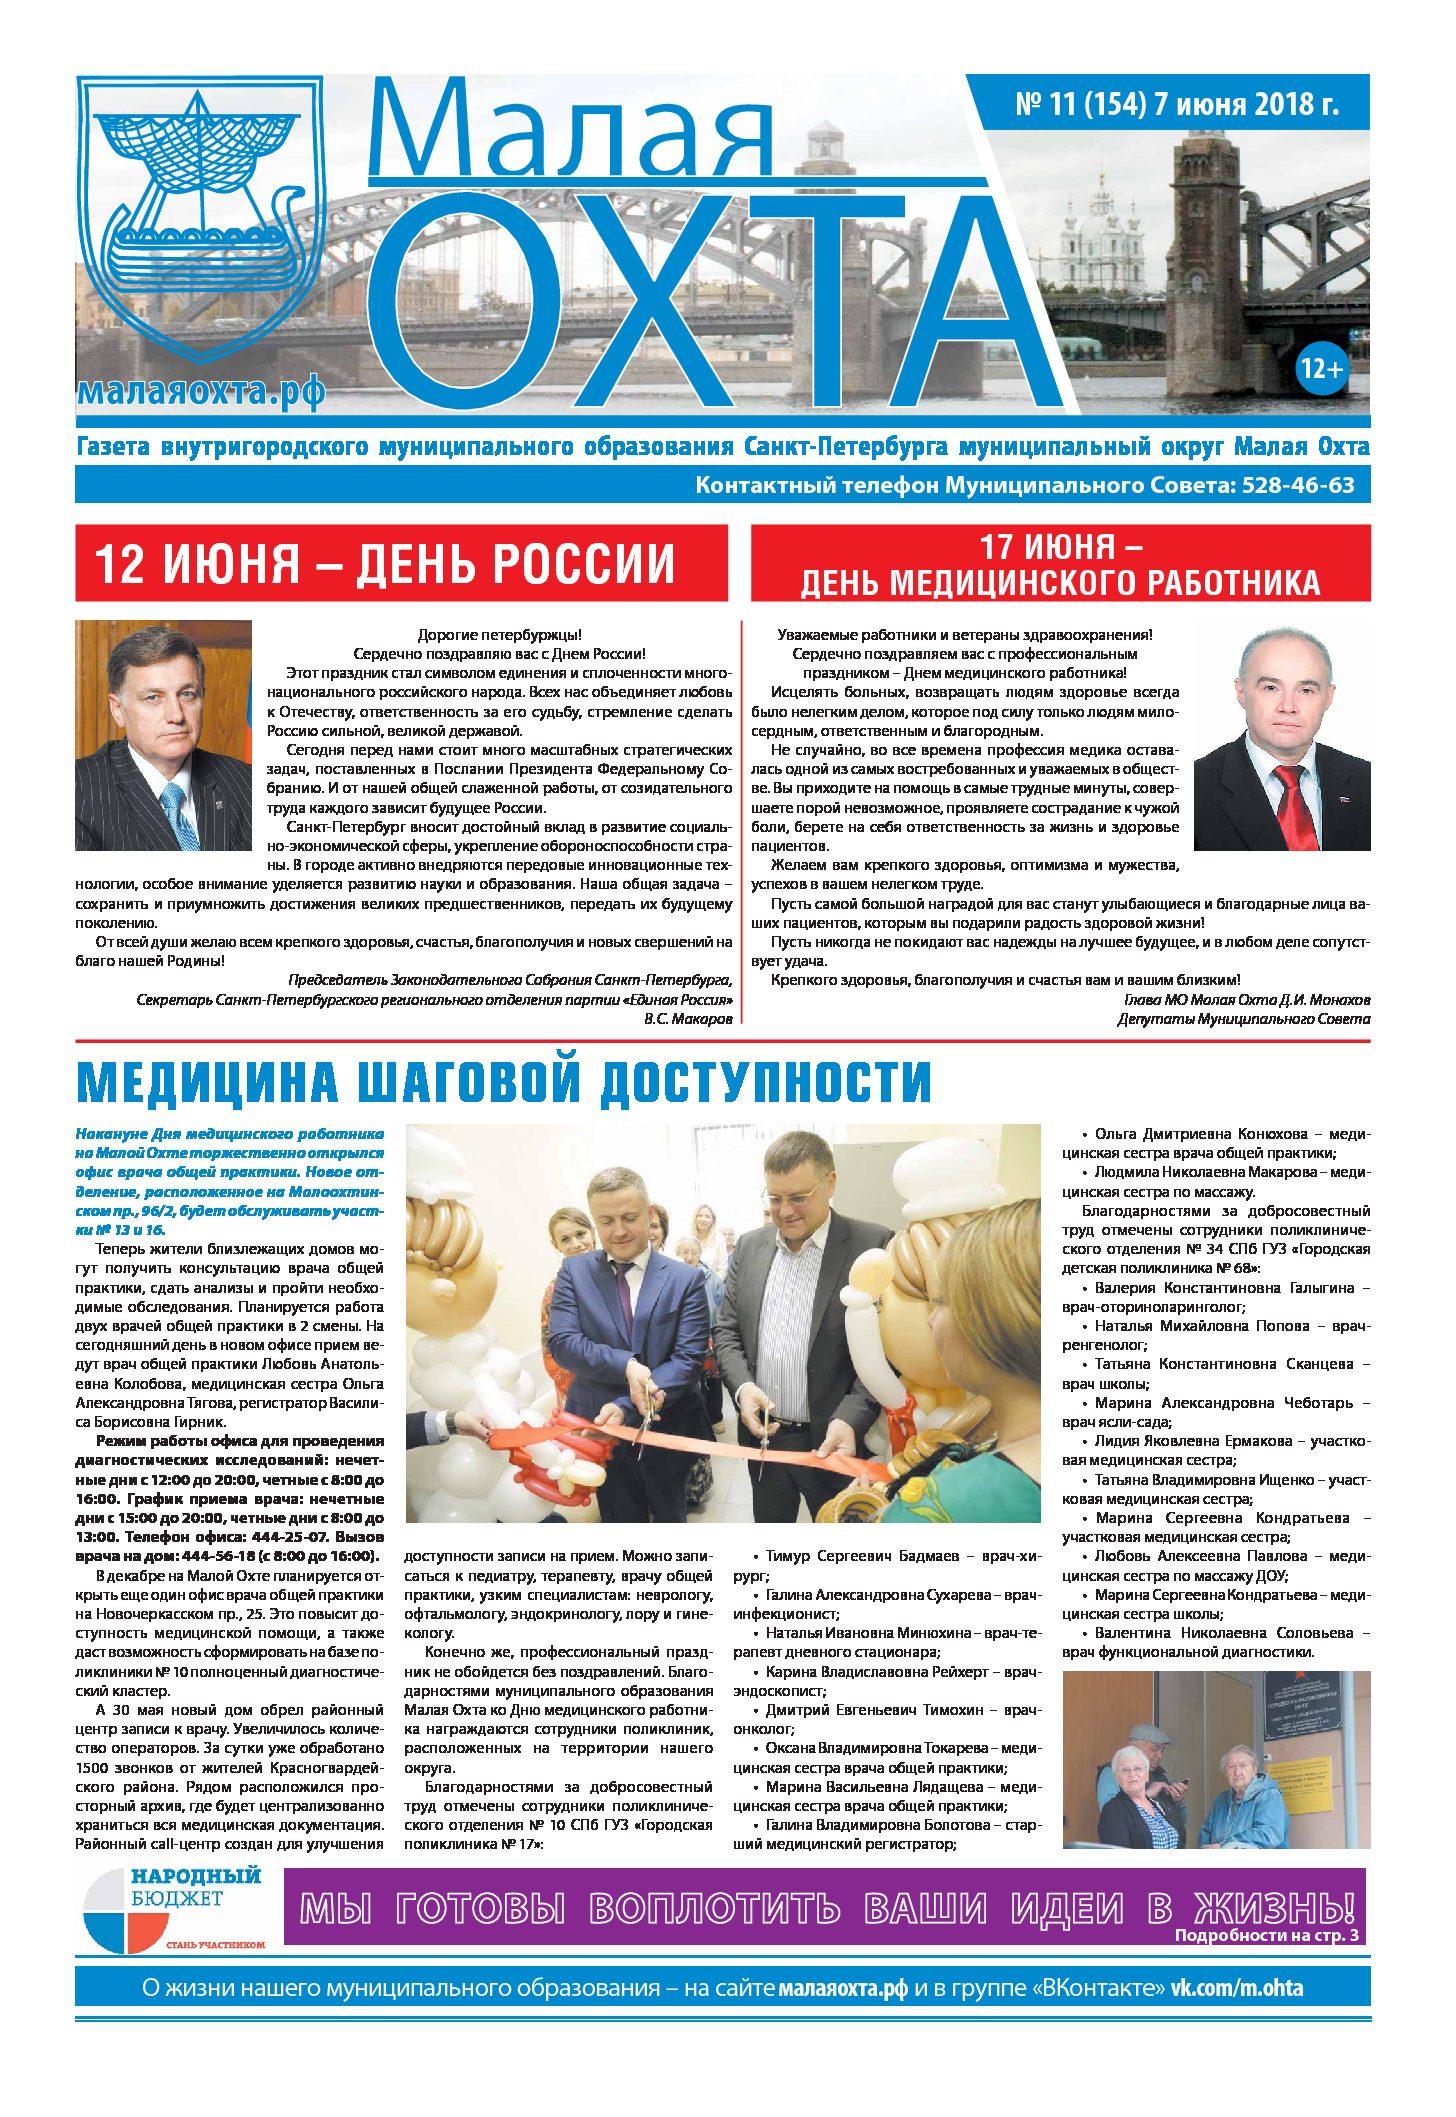 Газета №11 2018